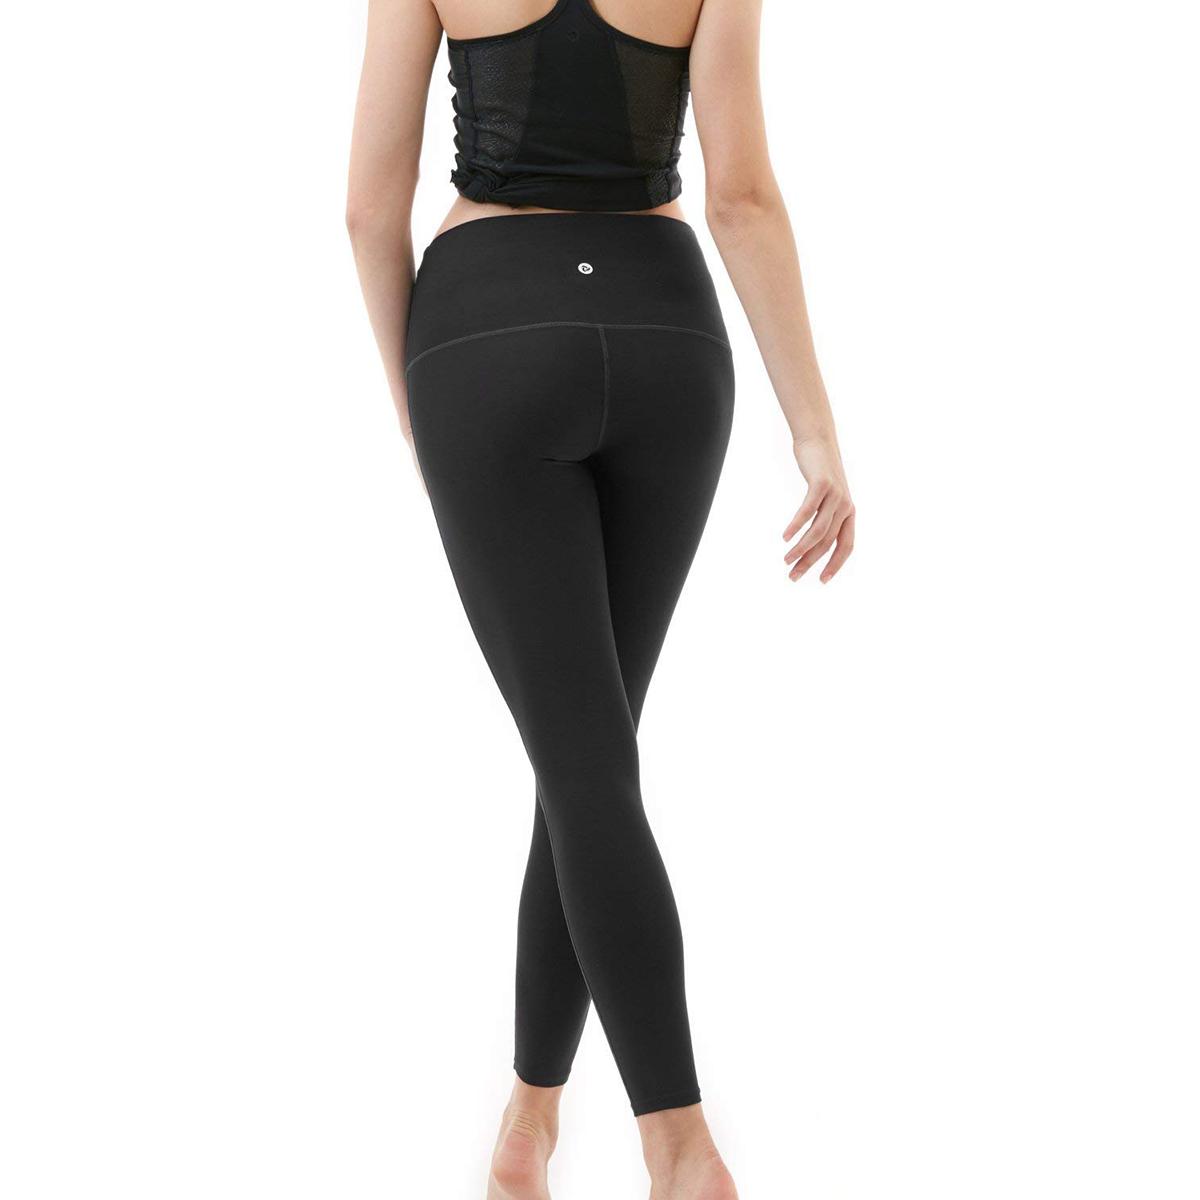 thumbnail 17 - TSLA Tesla FYP52 Women's High-Waisted Ultra-Stretch Tummy Control Yoga Pants